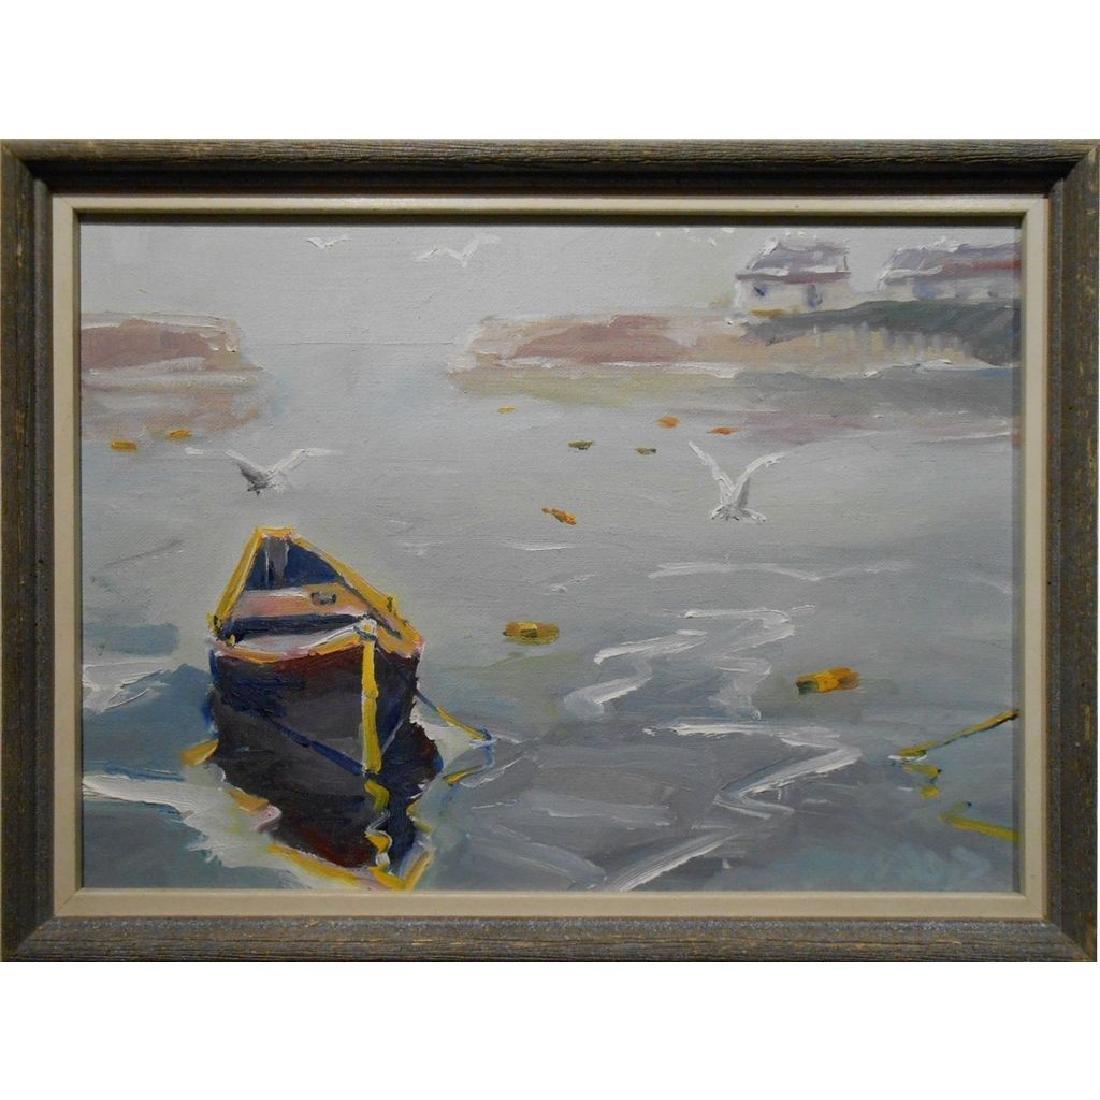 Small 1977 Oil Painting Cape Ann Massachusetts